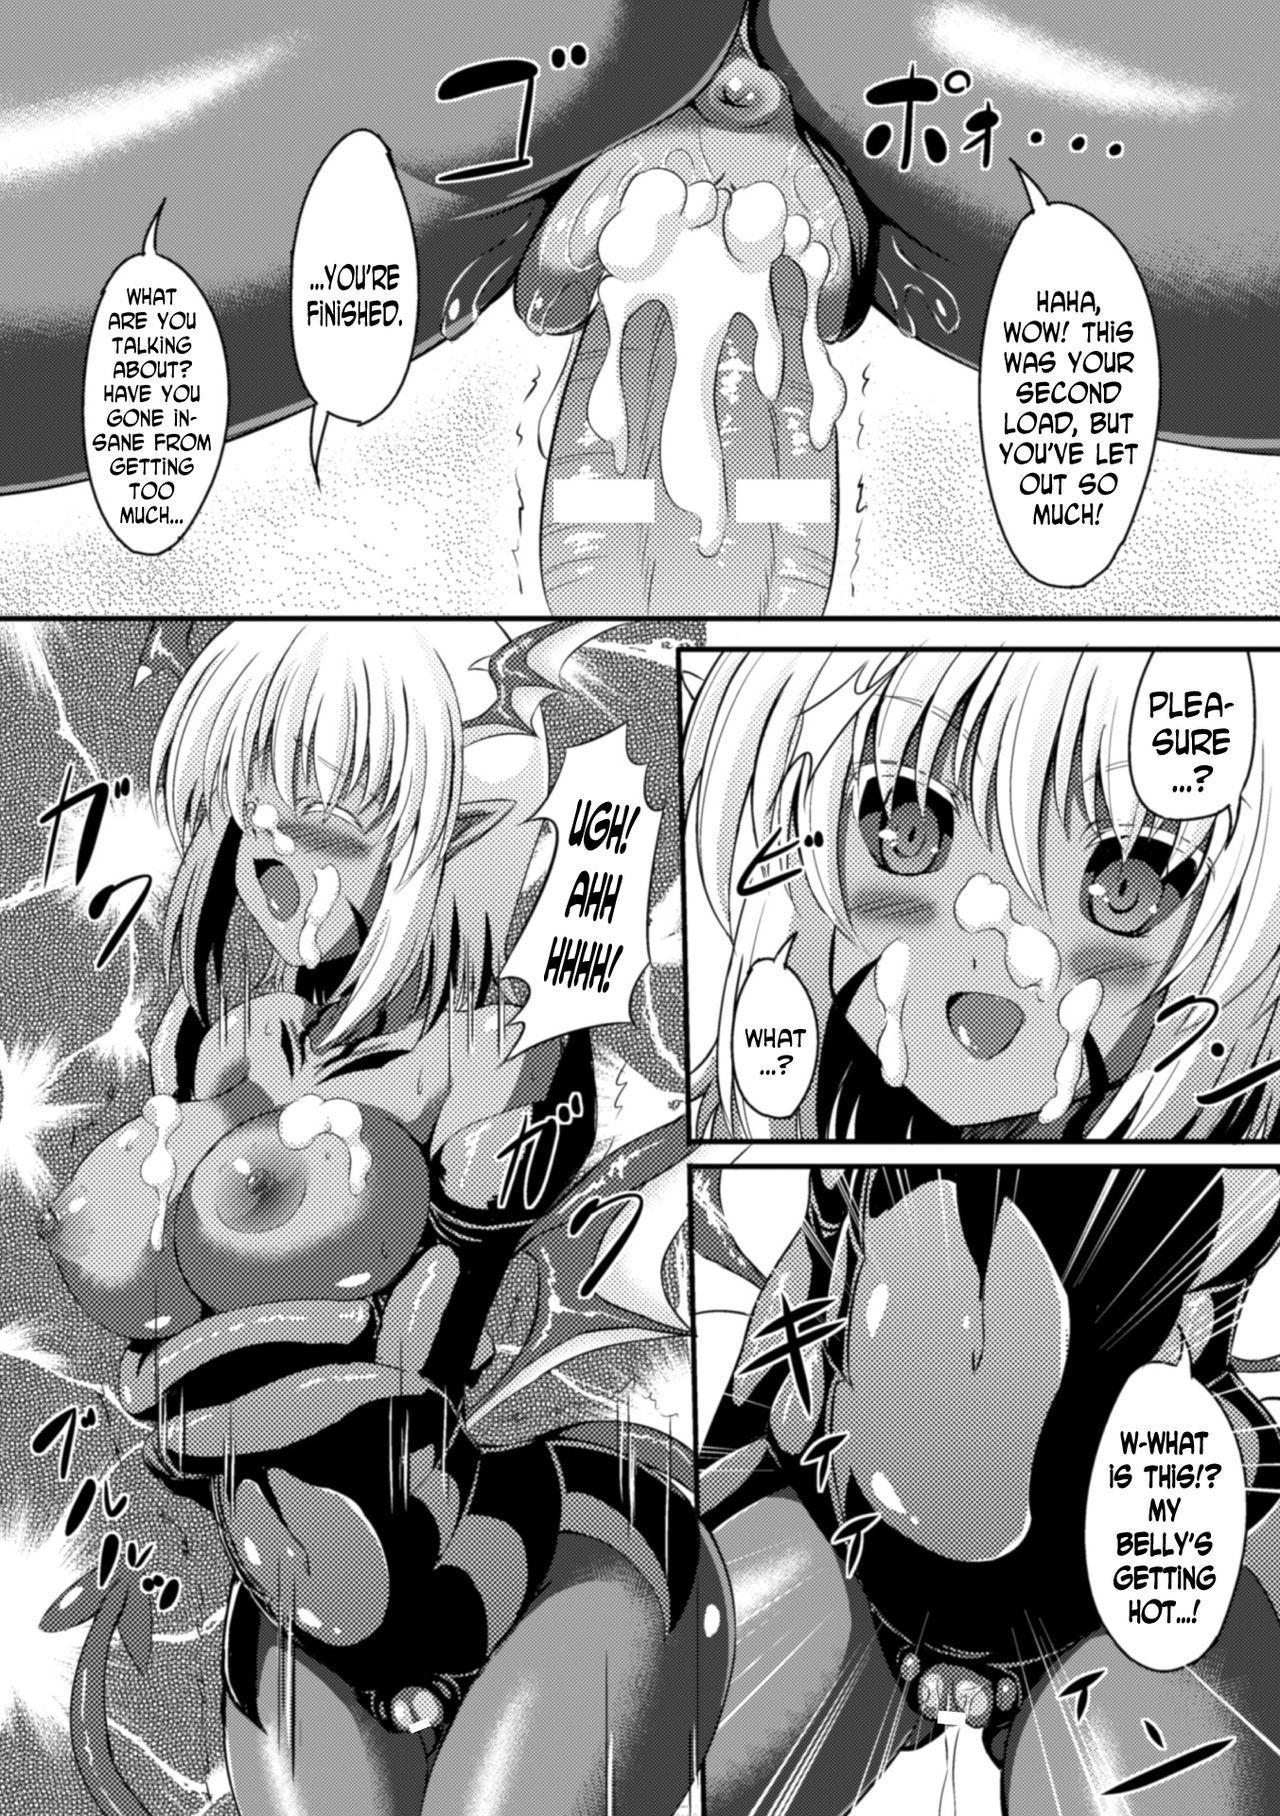 [Anthology] 2D Comic Magazine Tenshi ni Ochiru Akuma-tachi Vol. 1 Ch. 1-3 [English] [N04h] [Digital] 53